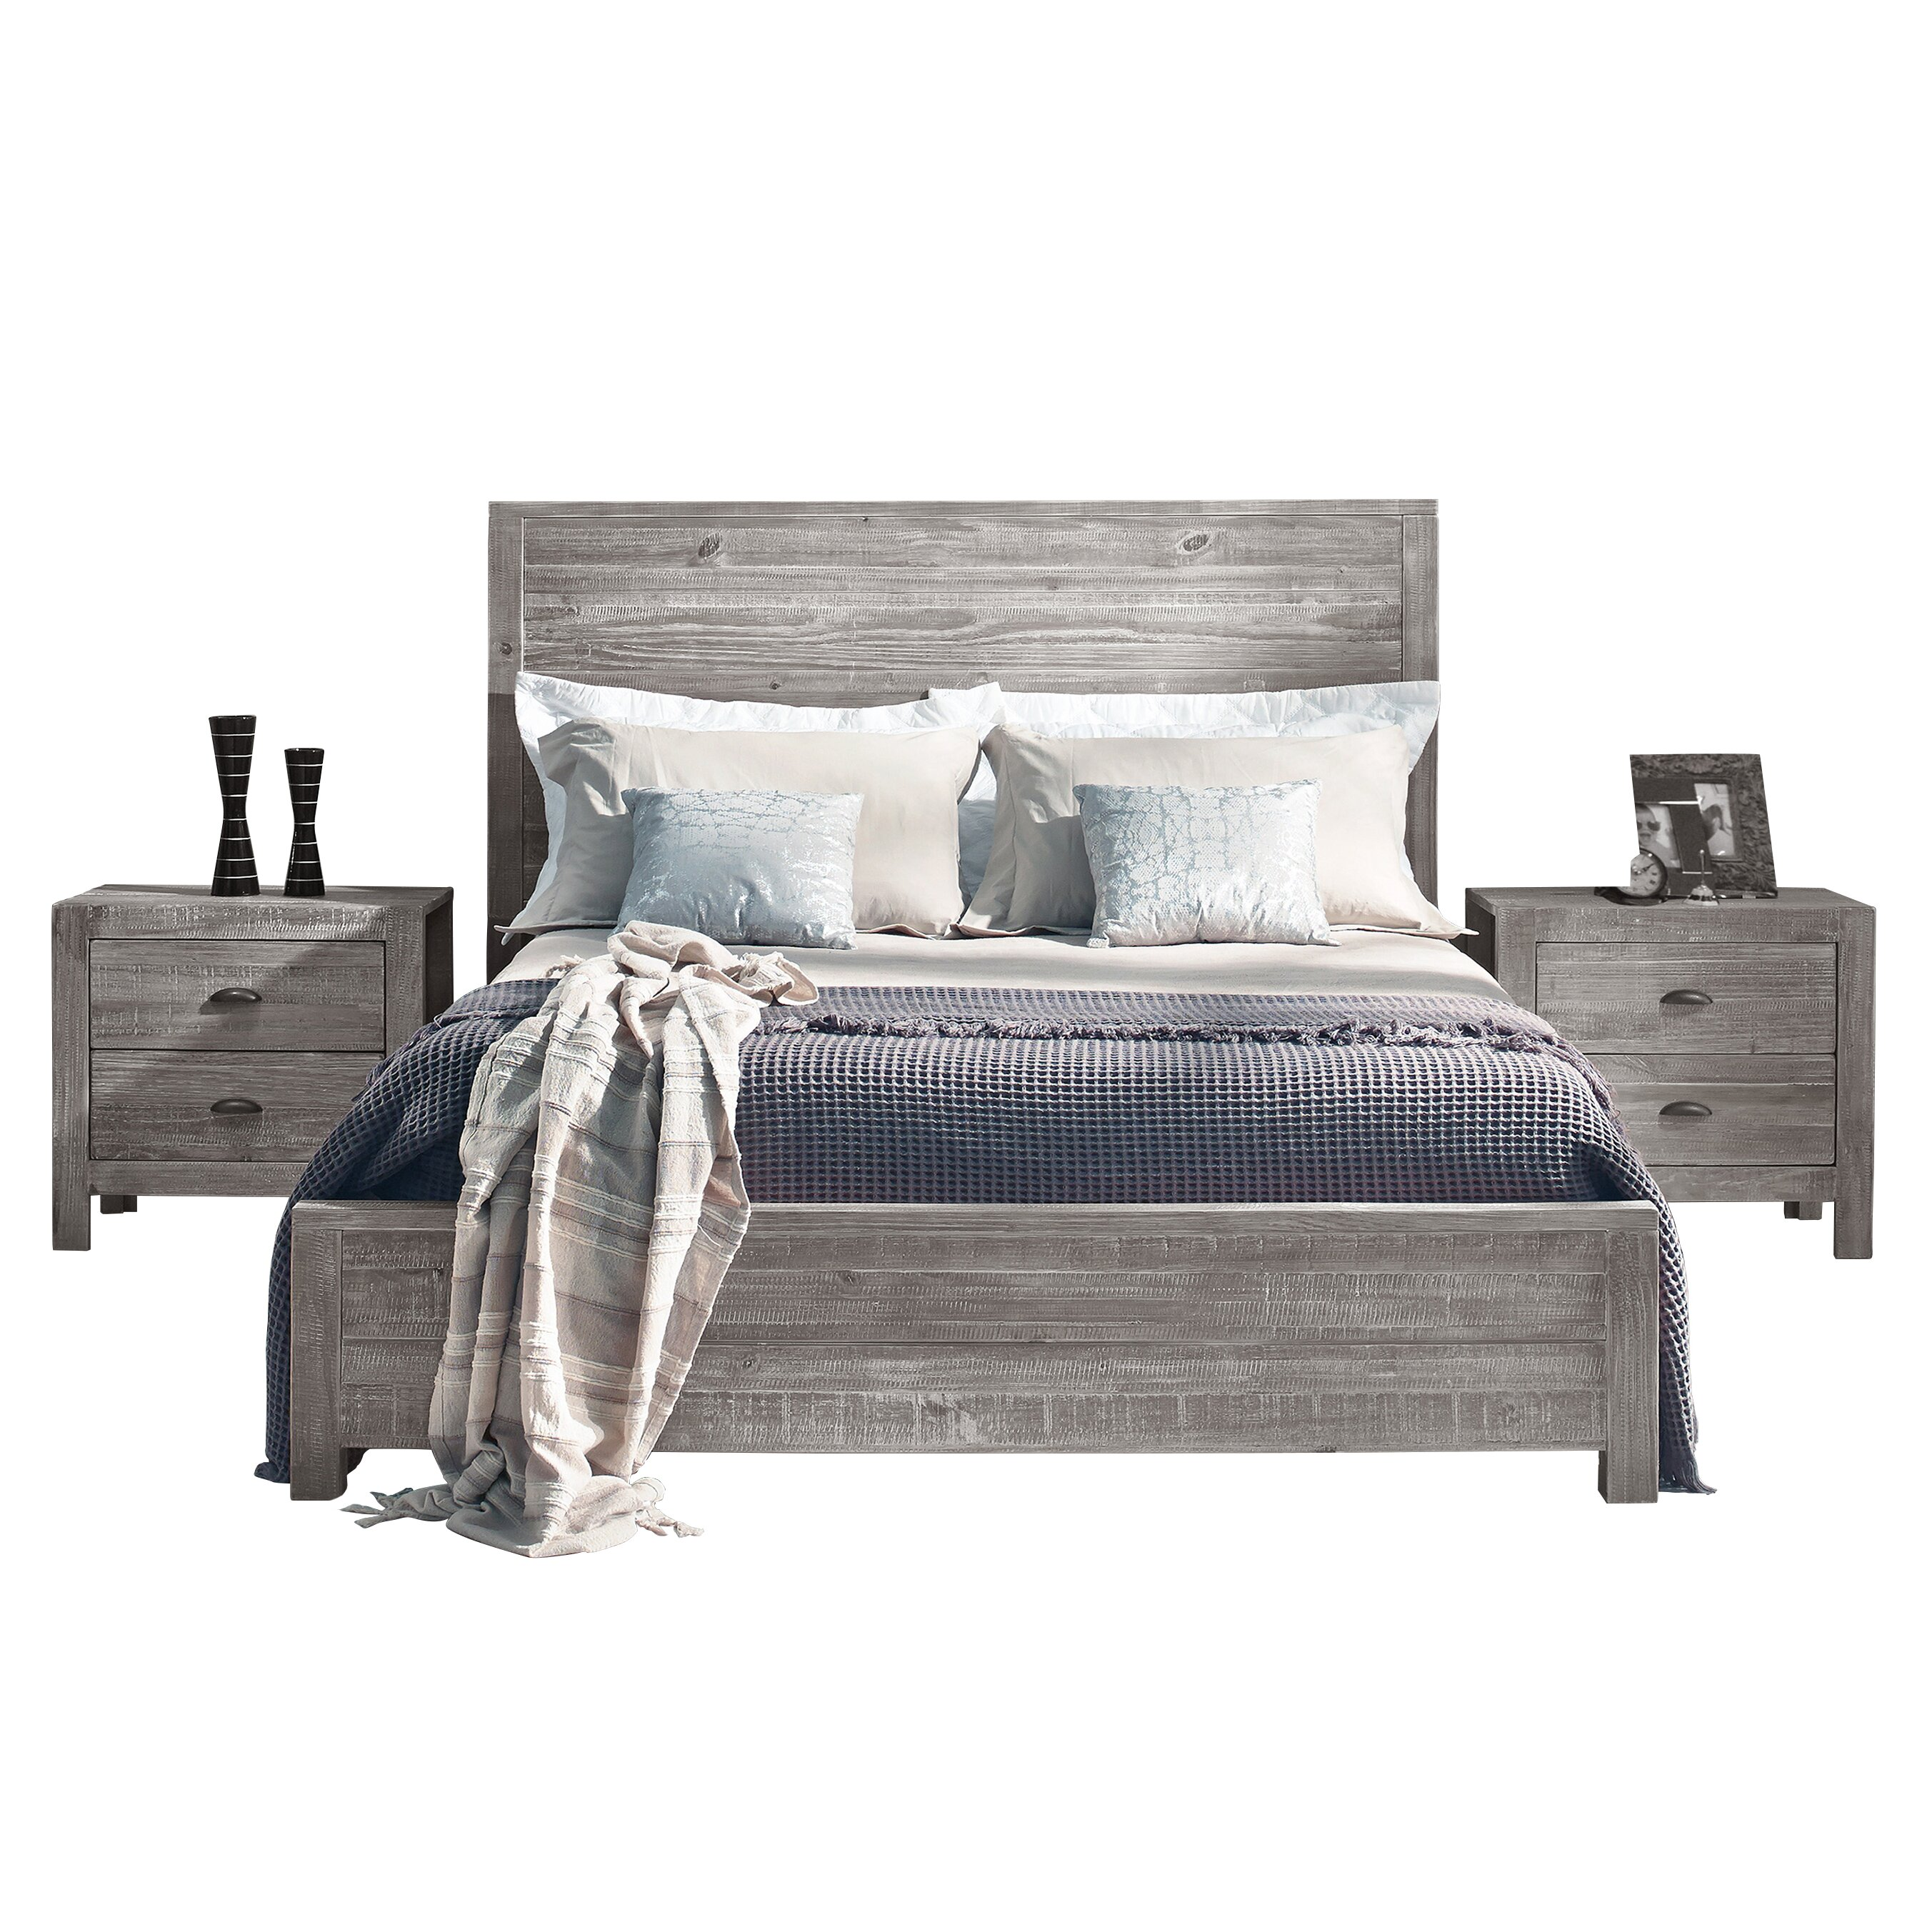 Furniture Furniture Barn Columbia Sc Ideas For Inspiring: Grain Wood Furniture Montauk Platform Bed & Reviews